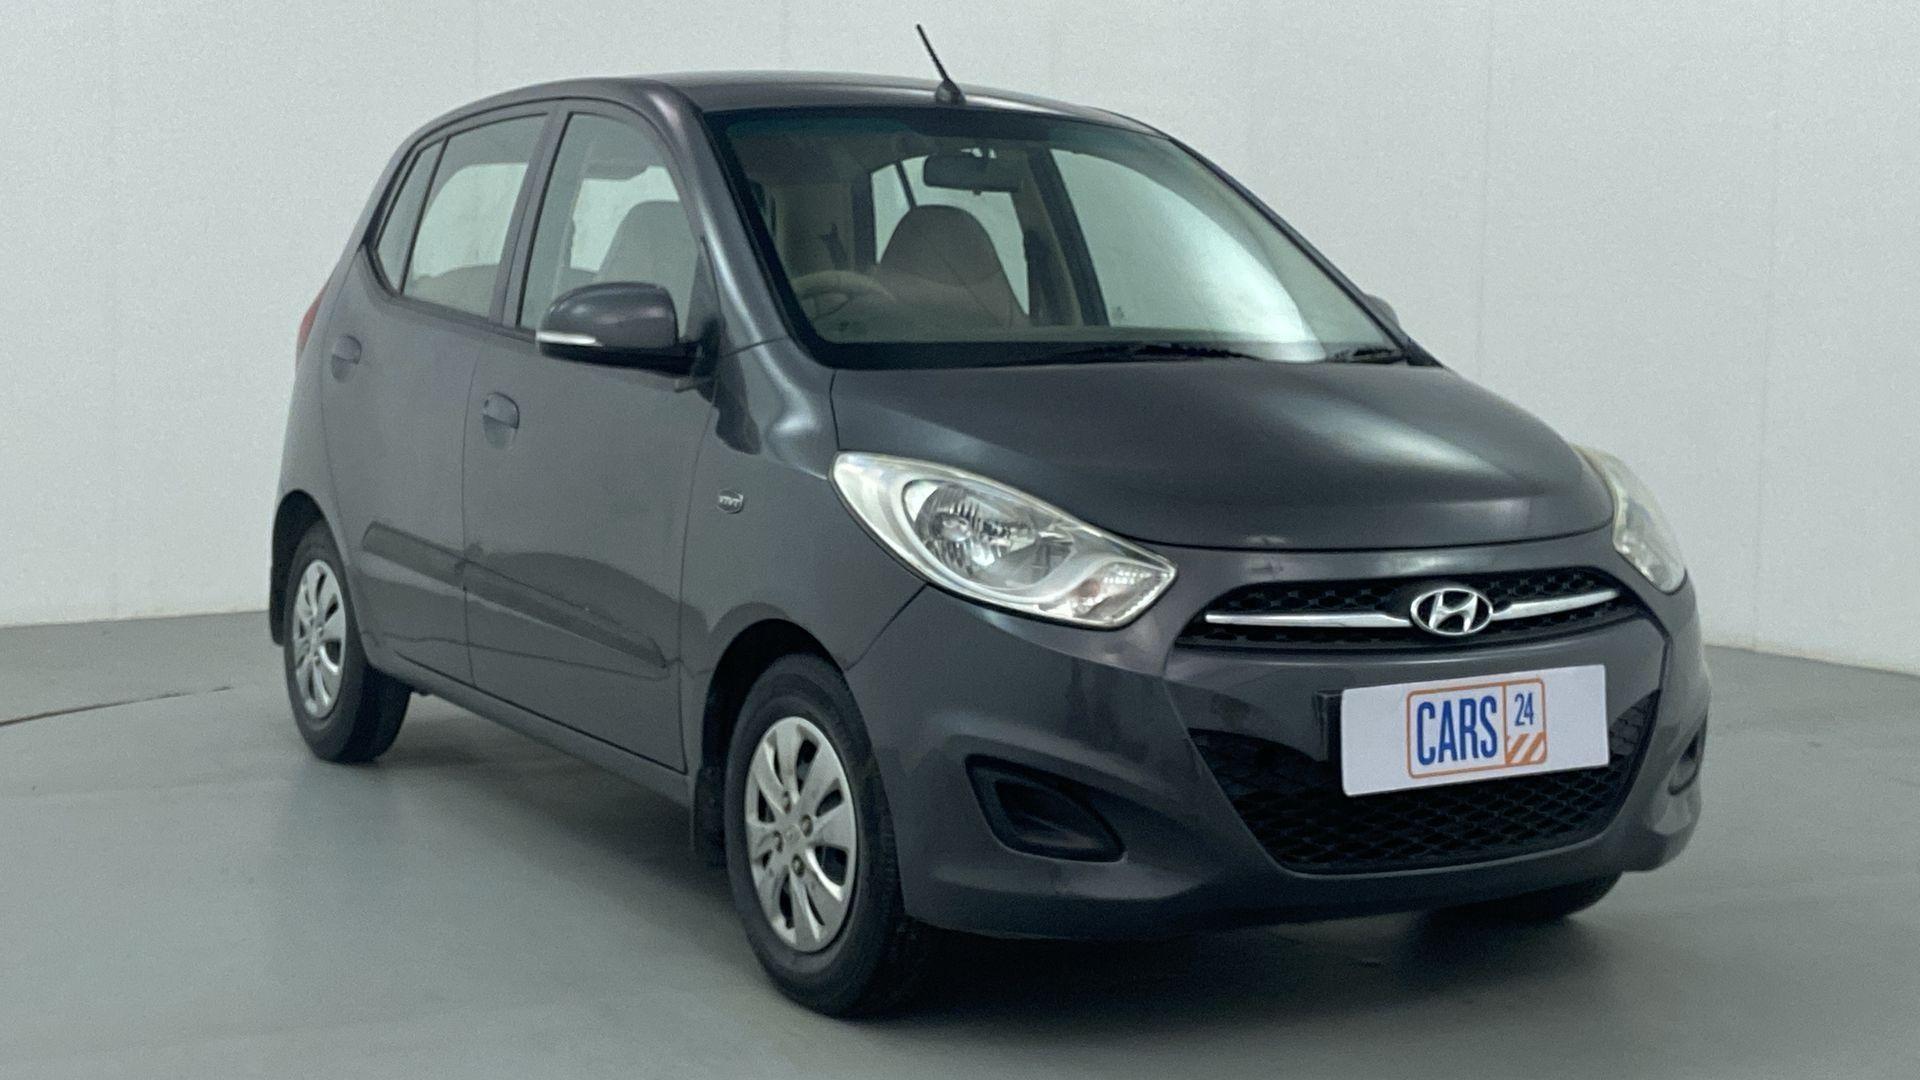 2011 Hyundai i10 MAGNA 1.2 KAPPA2